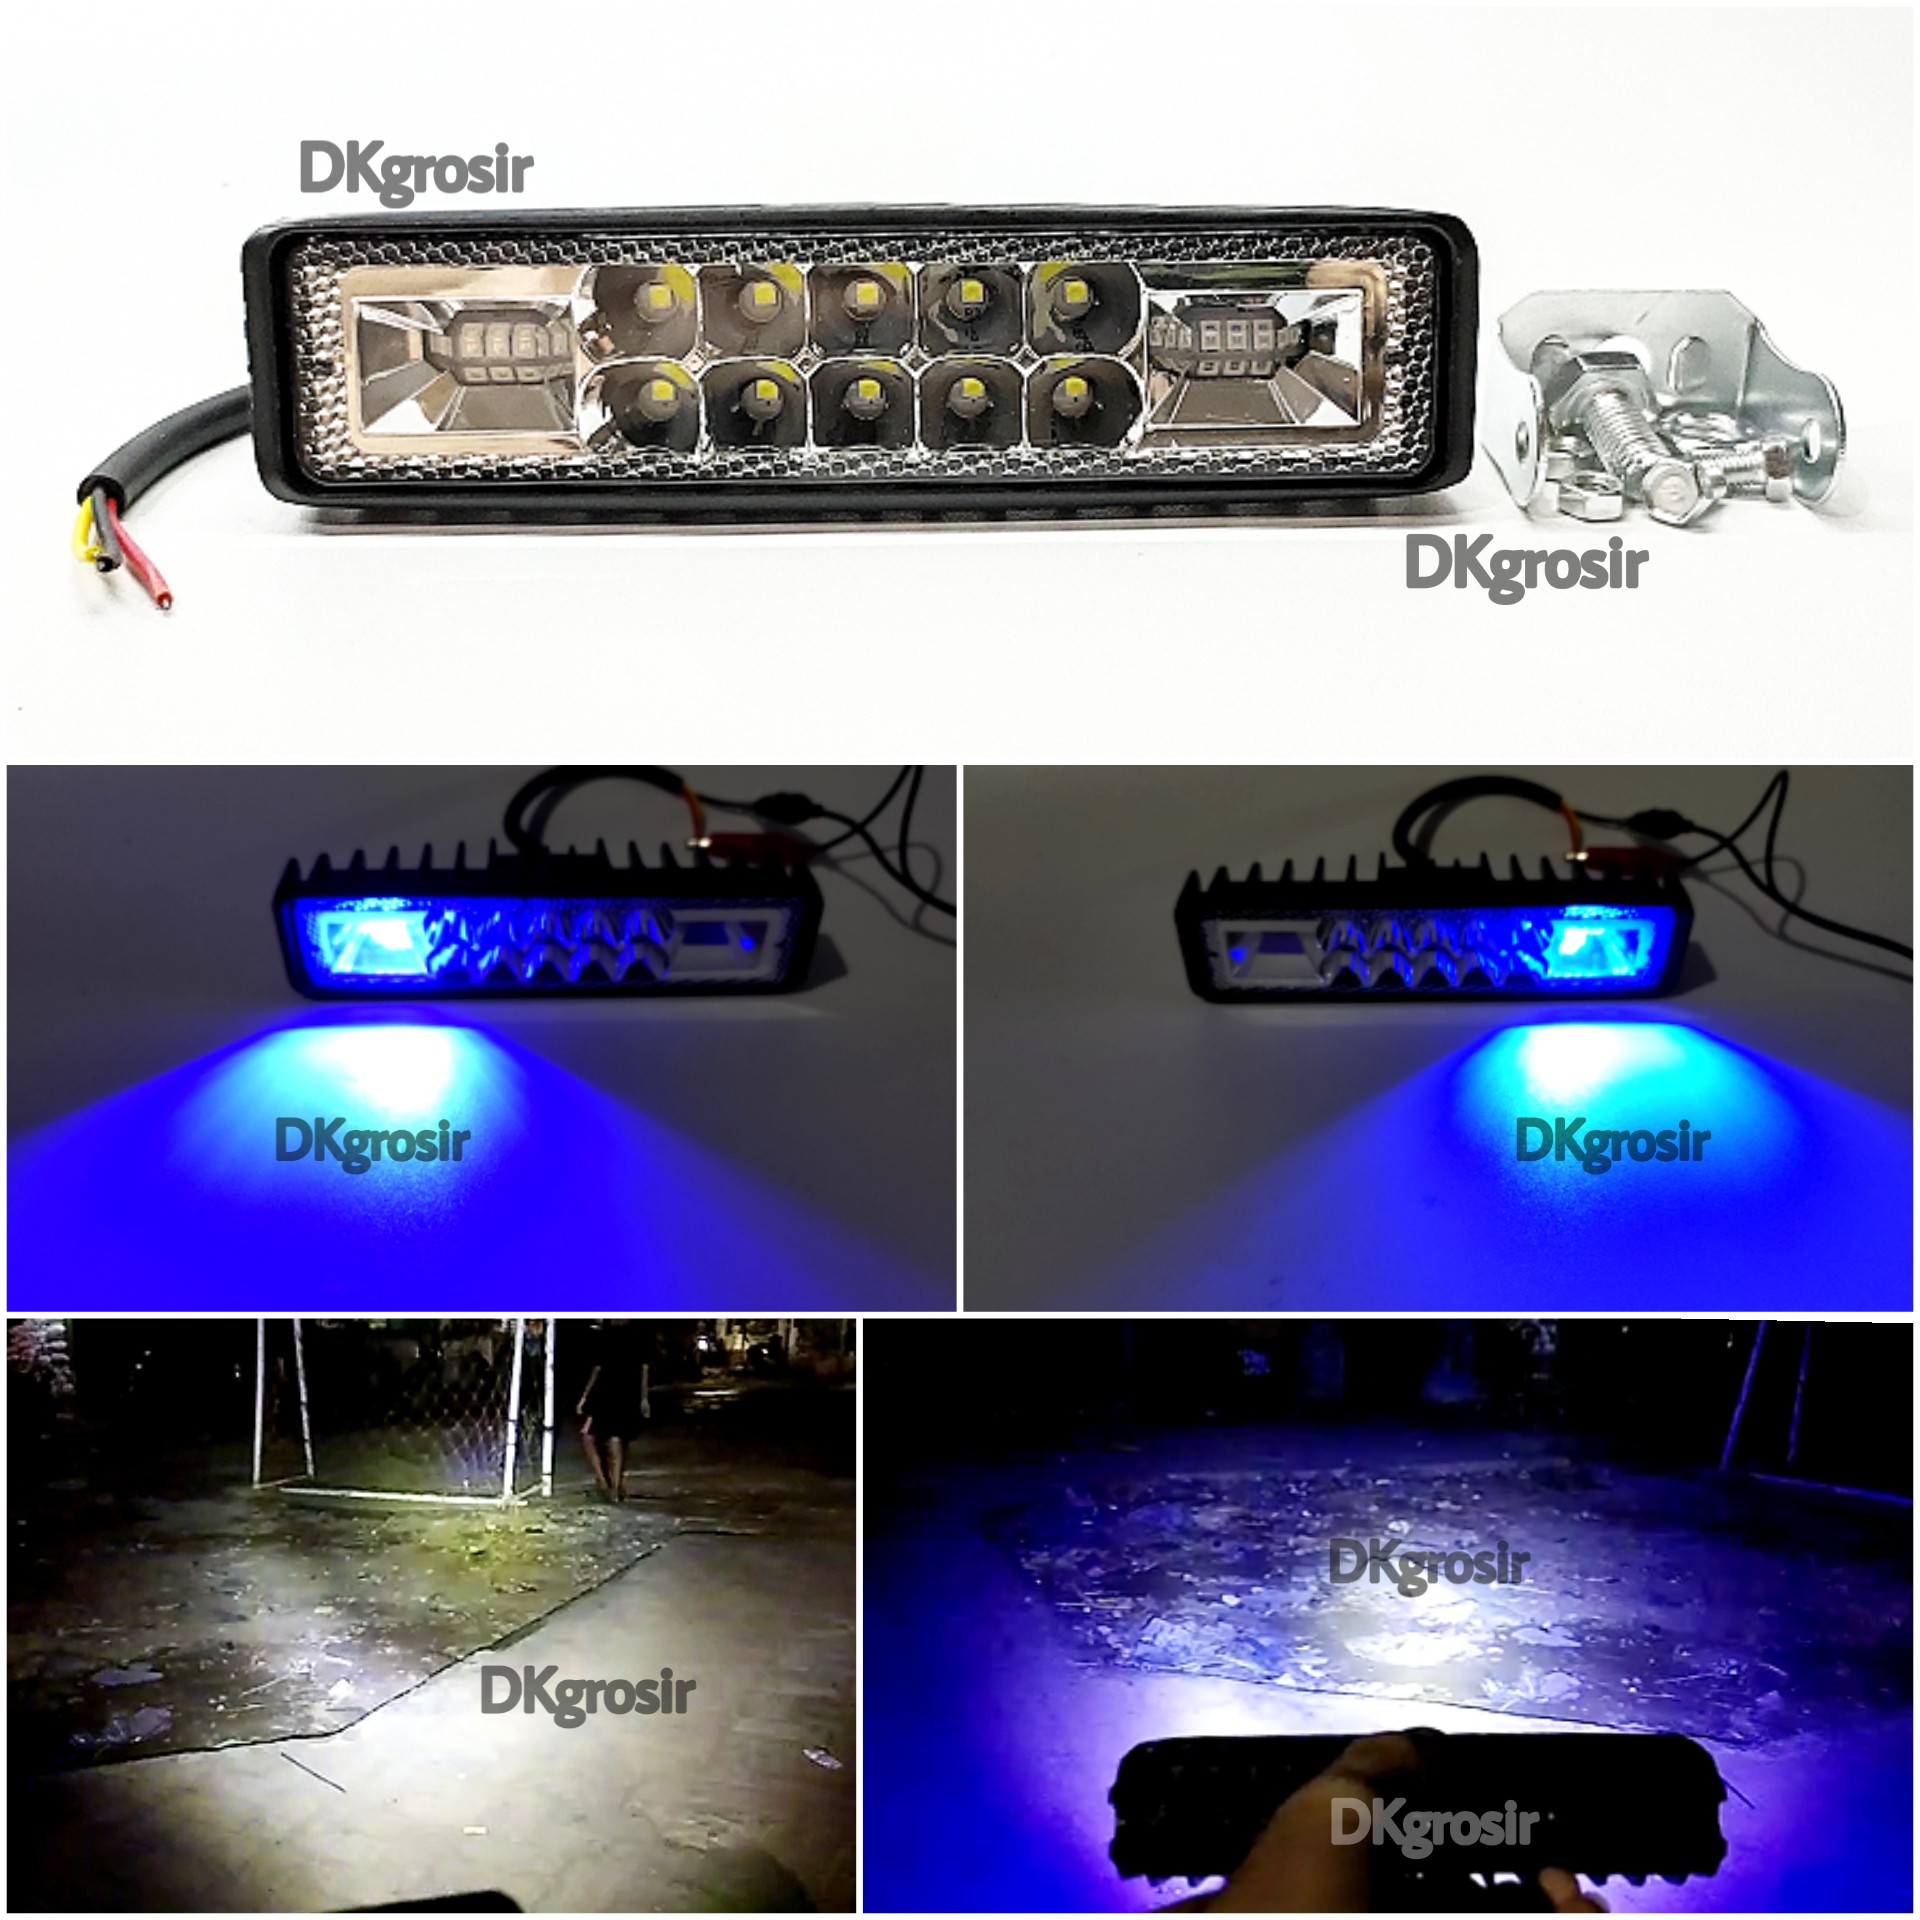 [ COD ] Lampu Tembak Sorot 10 Mata LED CWL Strobo Biru Kiri Kanan Slim Bar DKgrosir